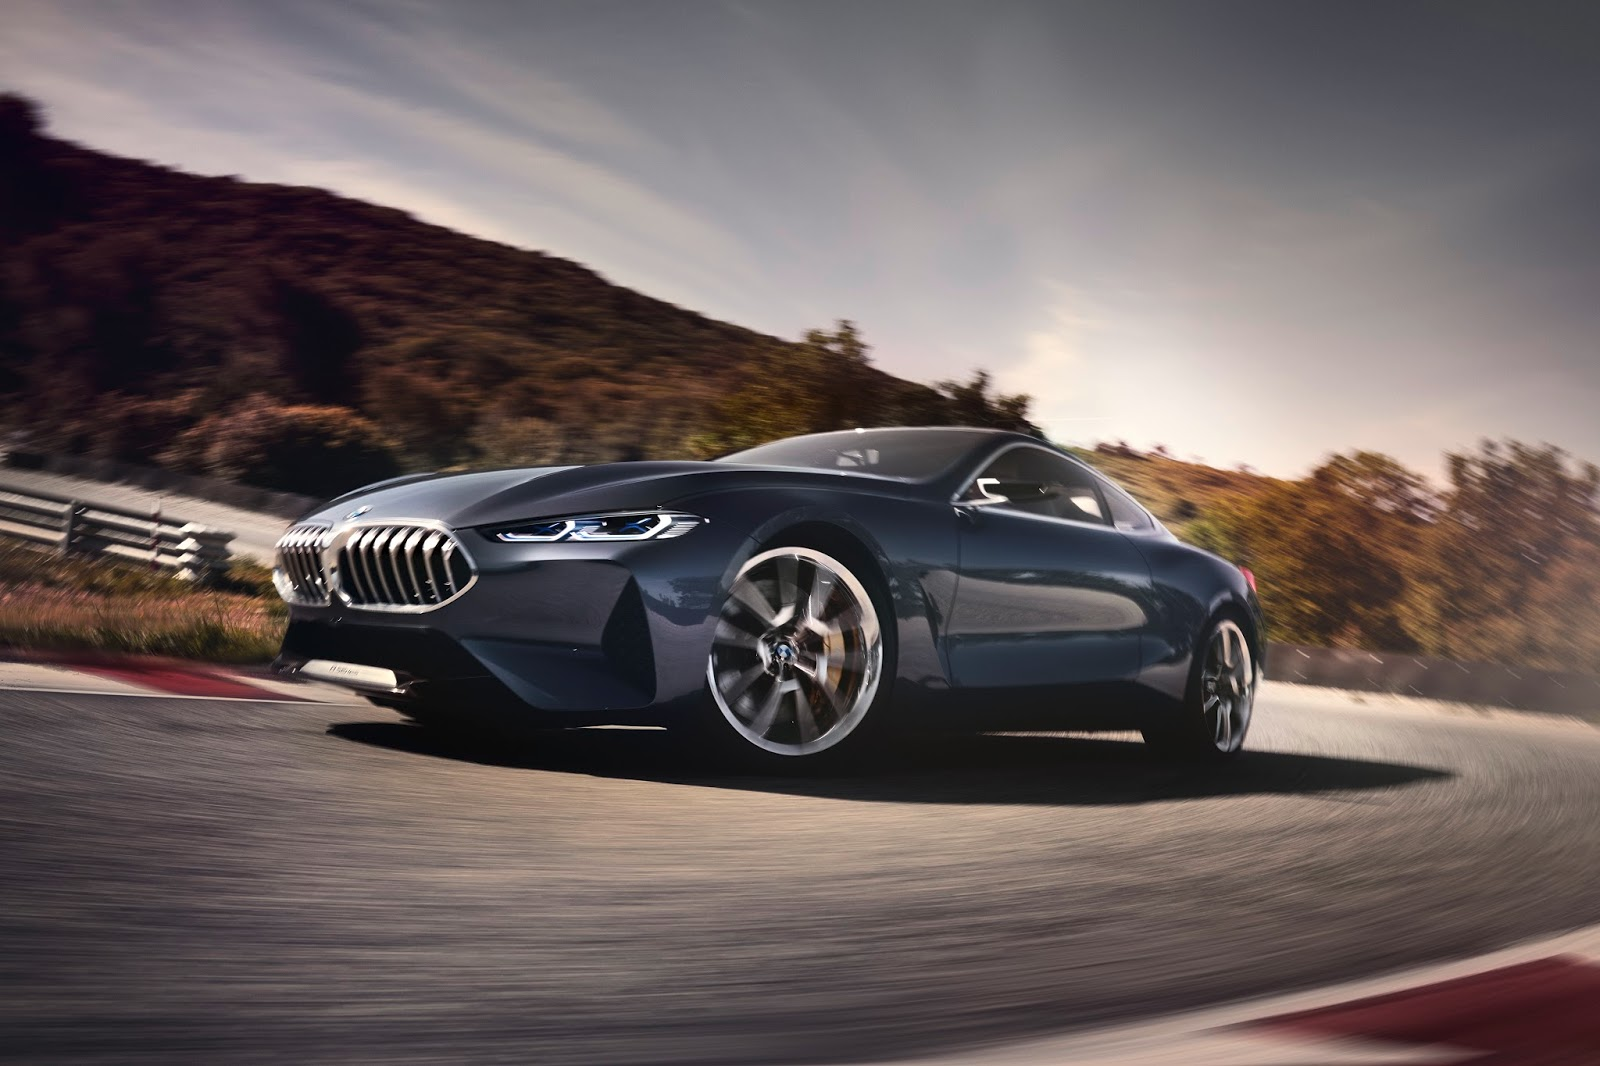 P90261172 highRes bmw concept 8 series Η BMW Σειρά 8 Coupe είναι η πεμπτουσία των μελλοντικών σπορ αυτοκινήτων BMW, BMW 8, BMW Concept, BMW Concept 8 Series, COUPE, dream car